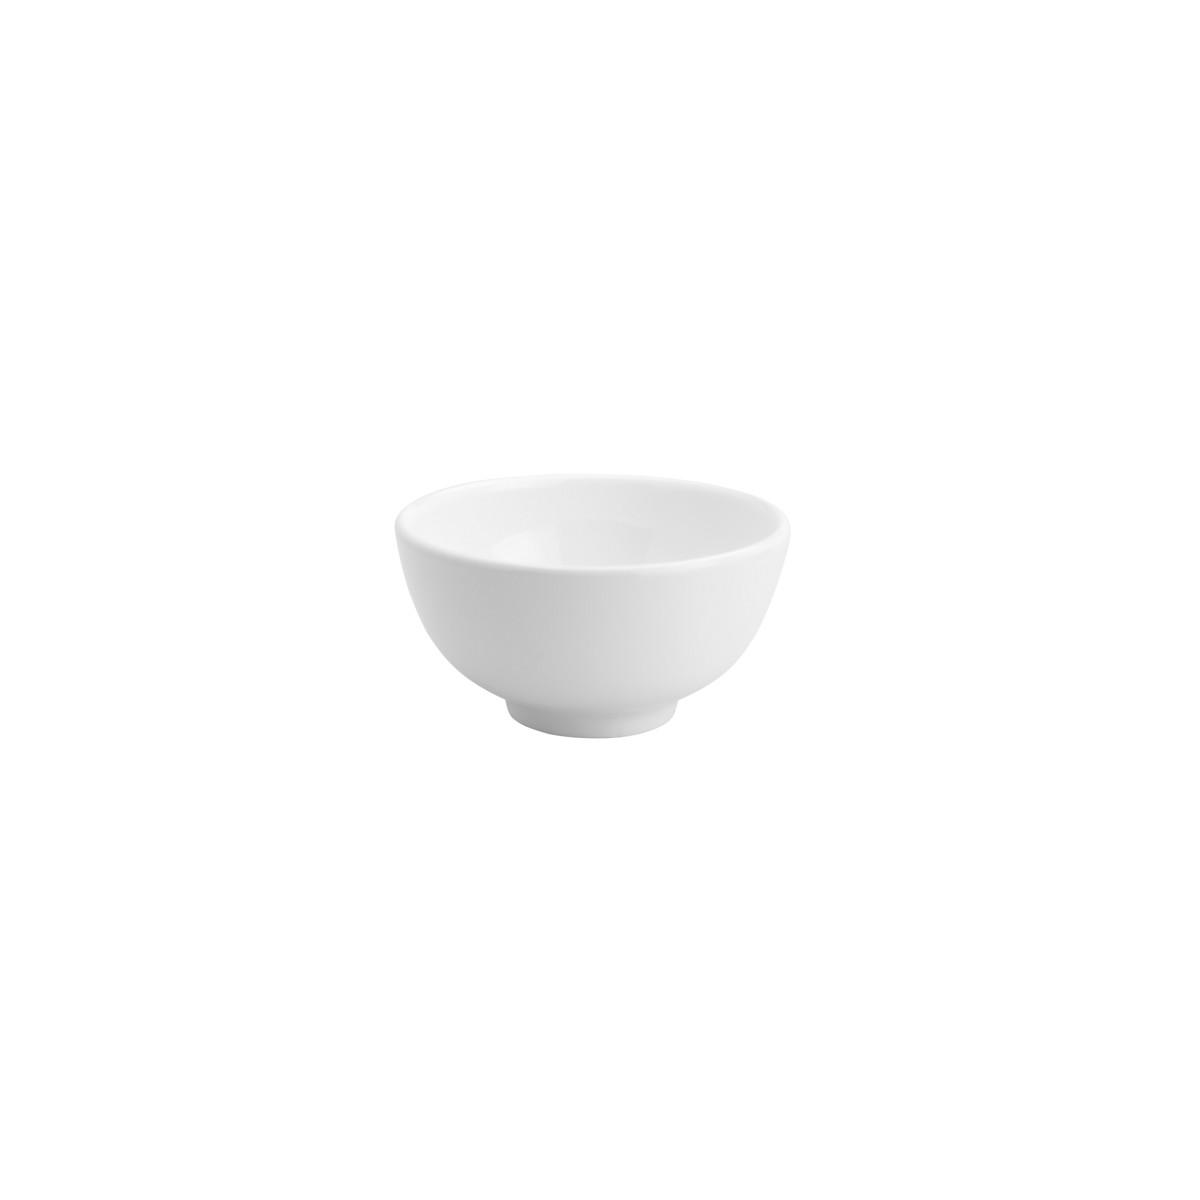 Tigela de Porcelana Redonda Clean 13cm - Lyor